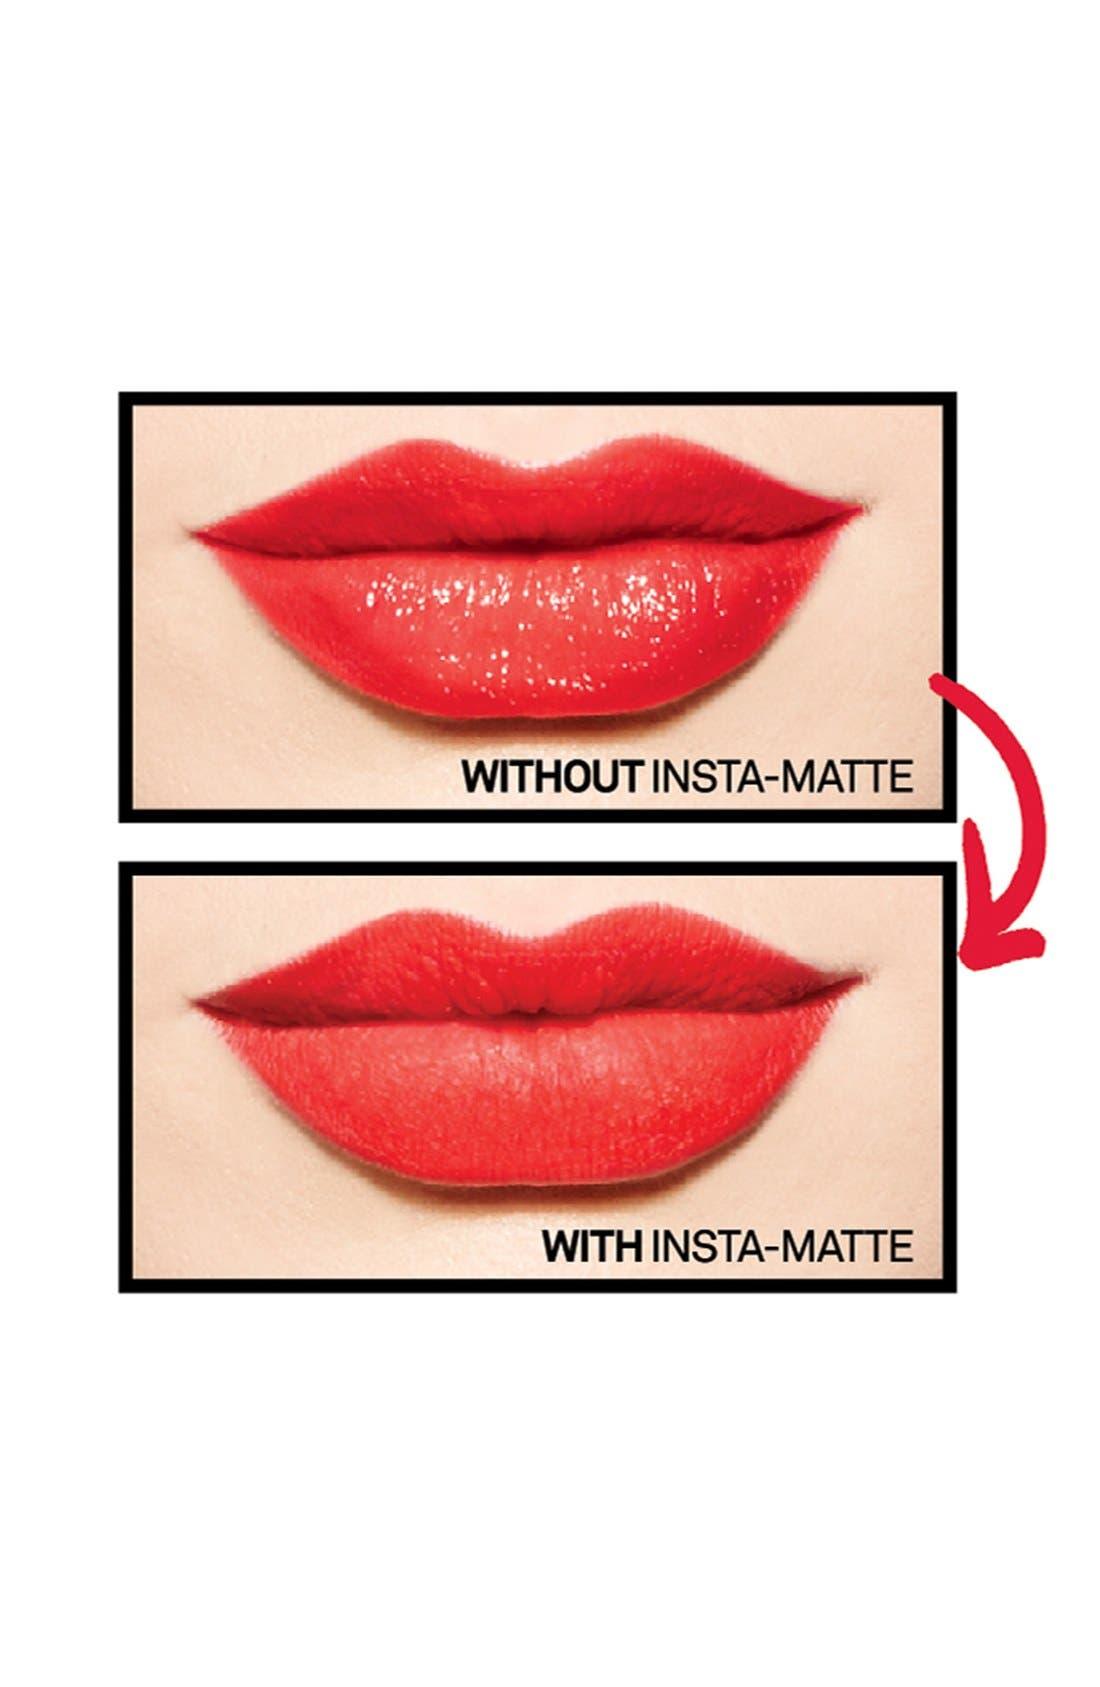 Insta-Matte Lipstick Transformer,                             Alternate thumbnail 3, color,                             000